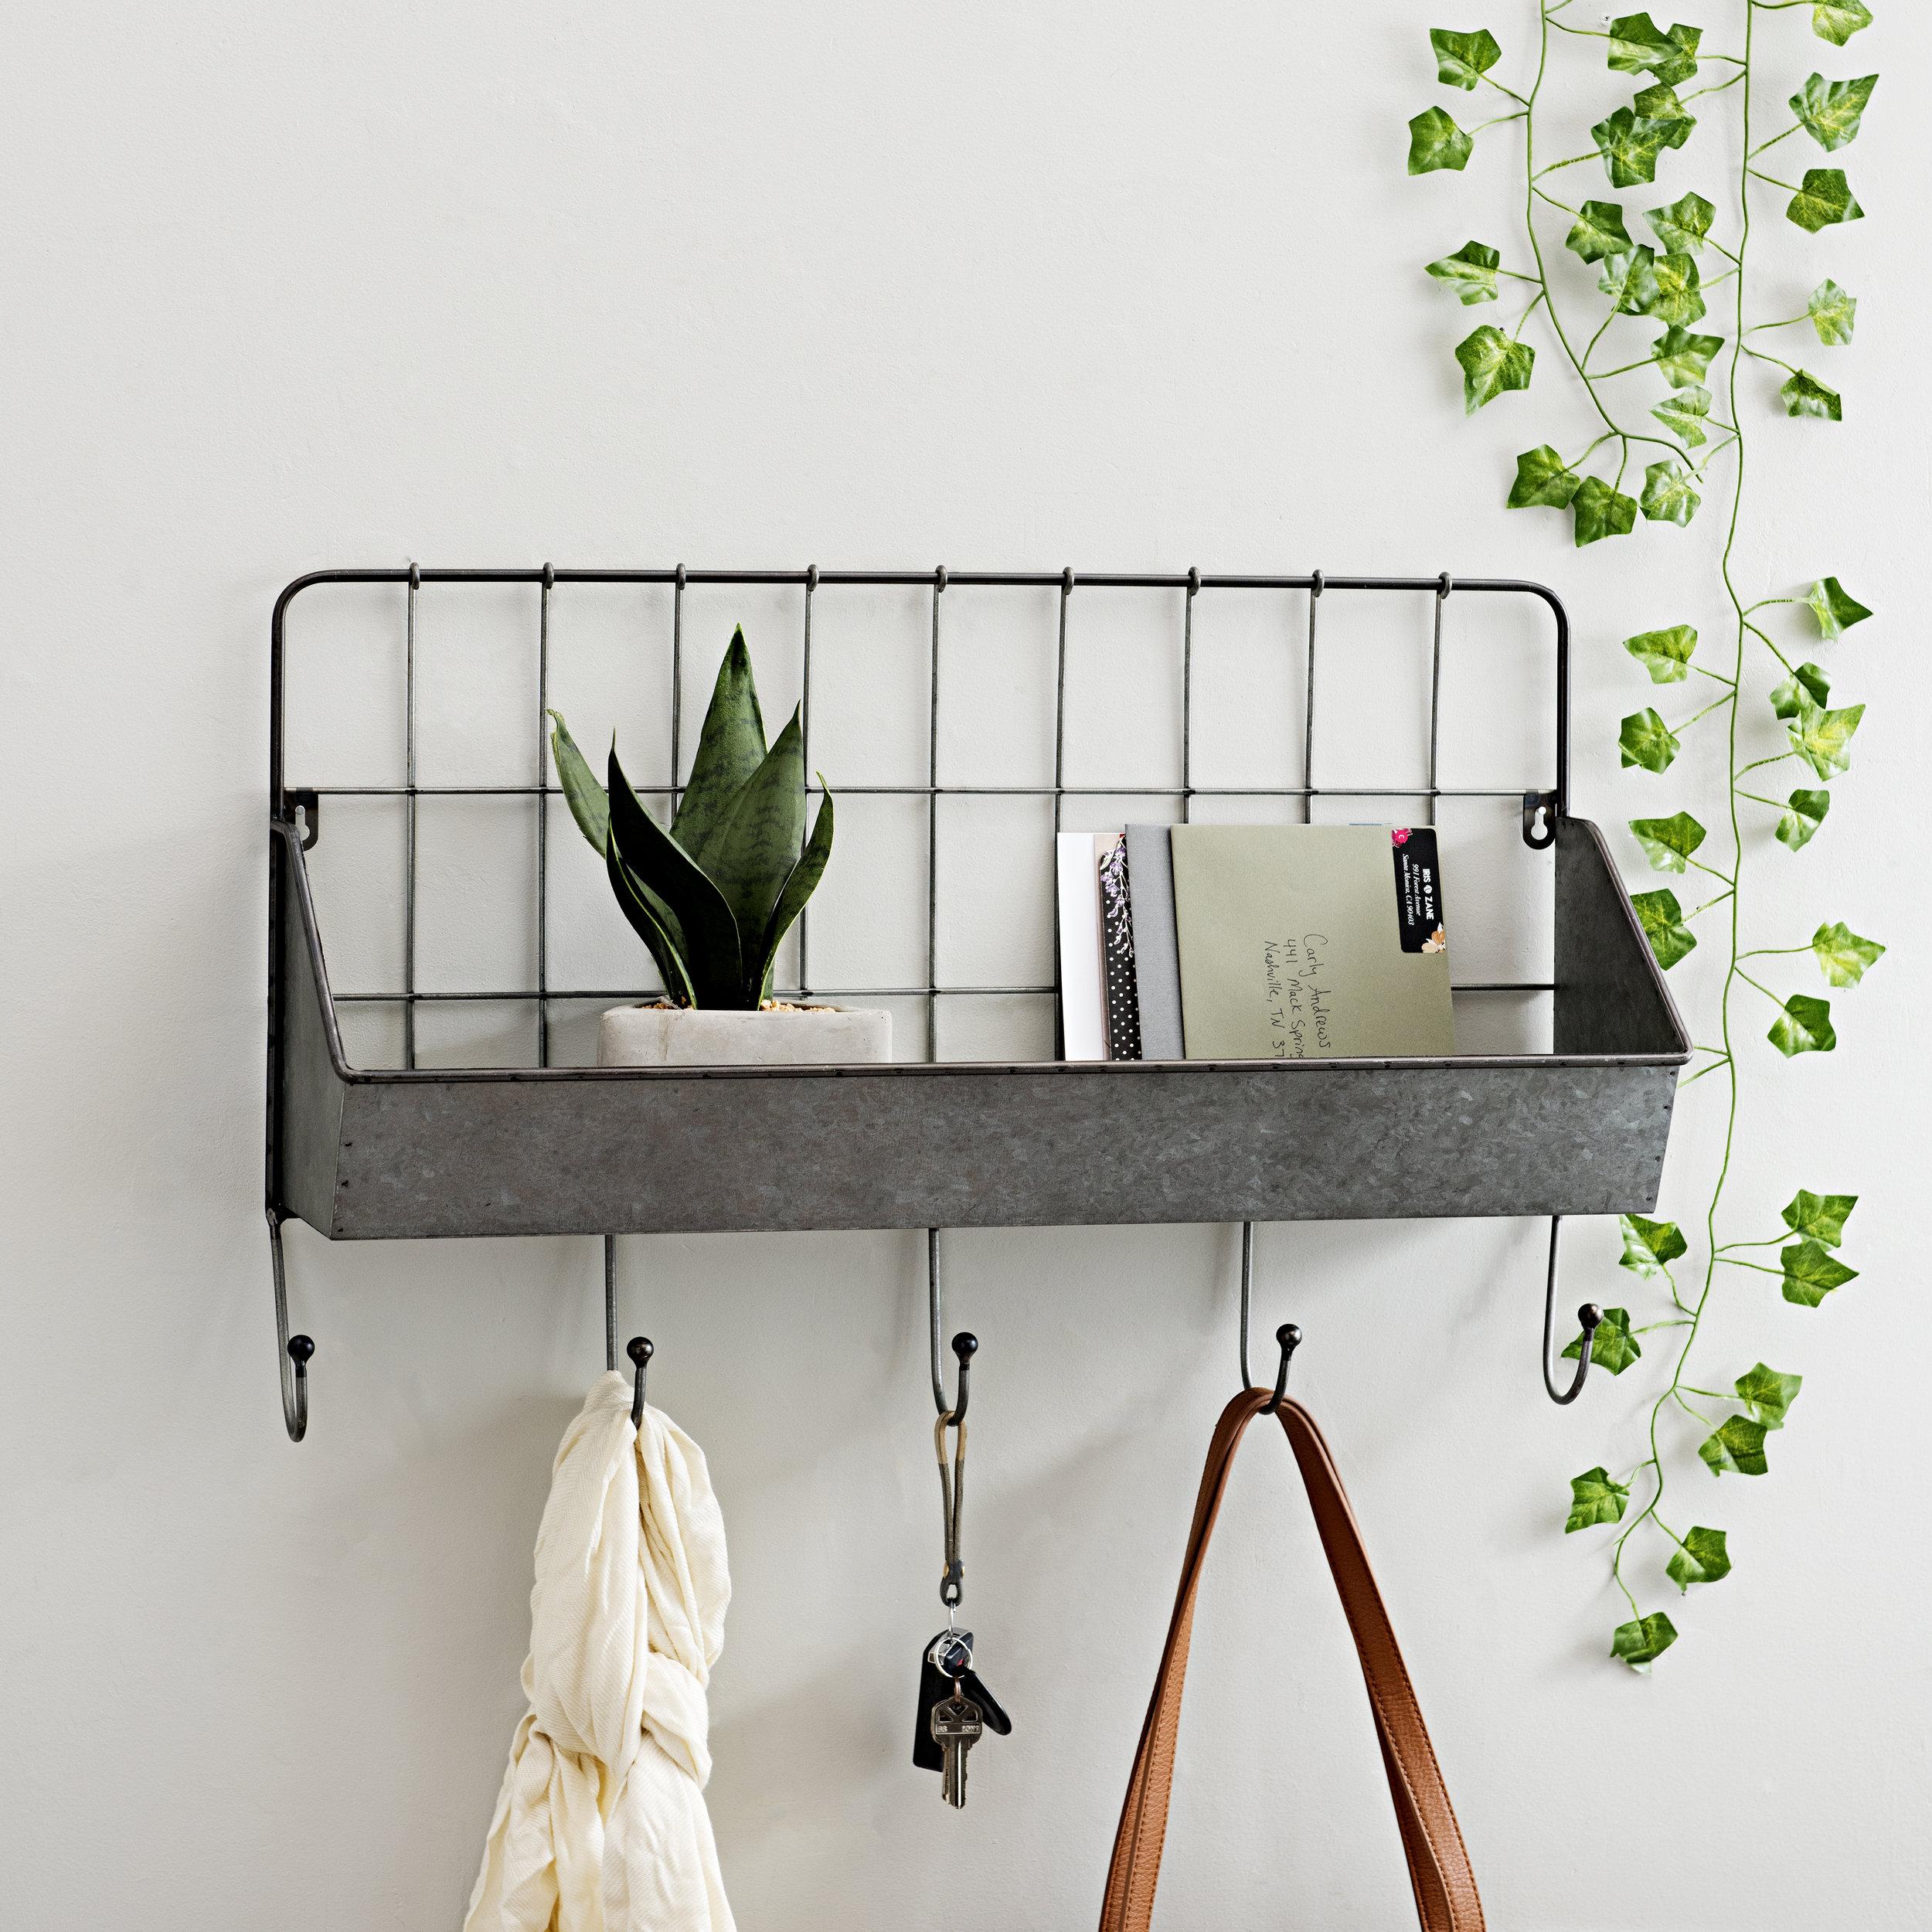 Kirkland's - Galvanized Metal Pocket Shelf with Hooks